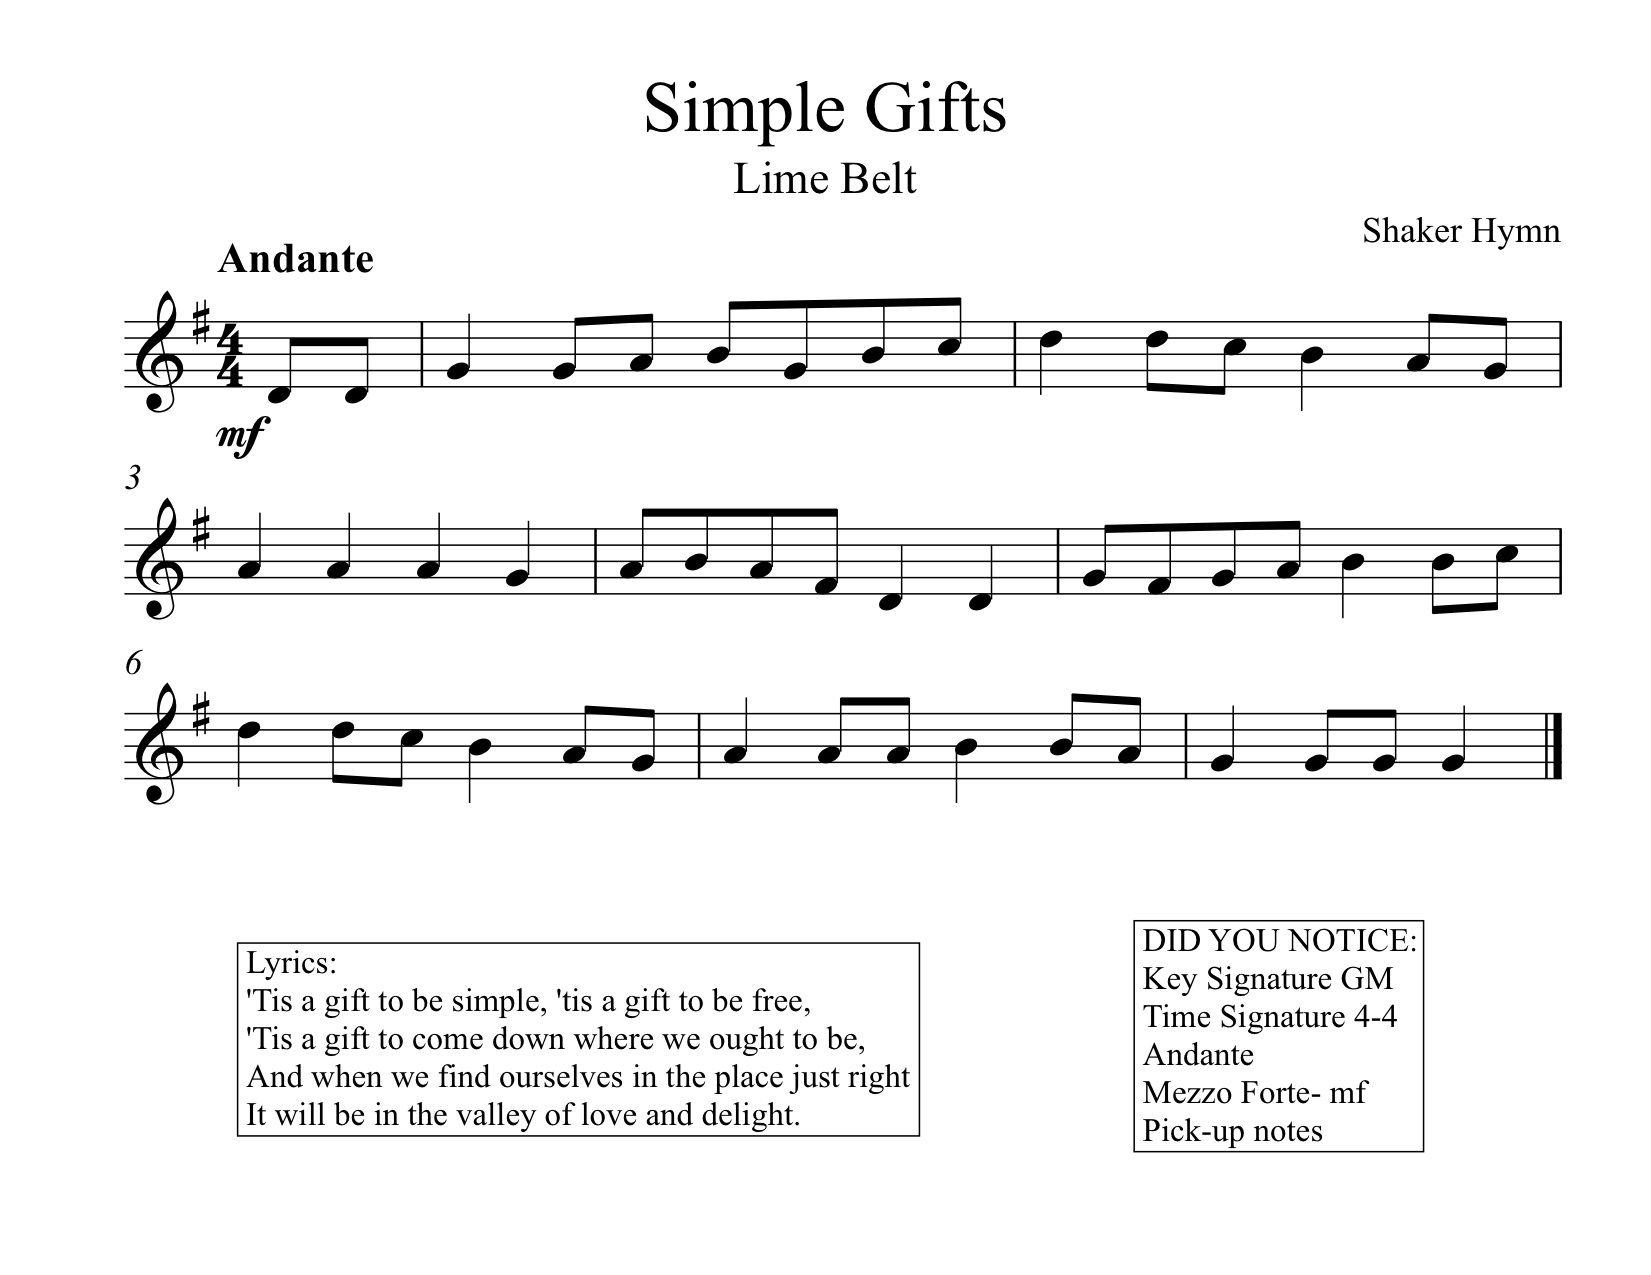 Fifth Grade Recorder Karate Teaching Music Music Curriculum Recorder Karate